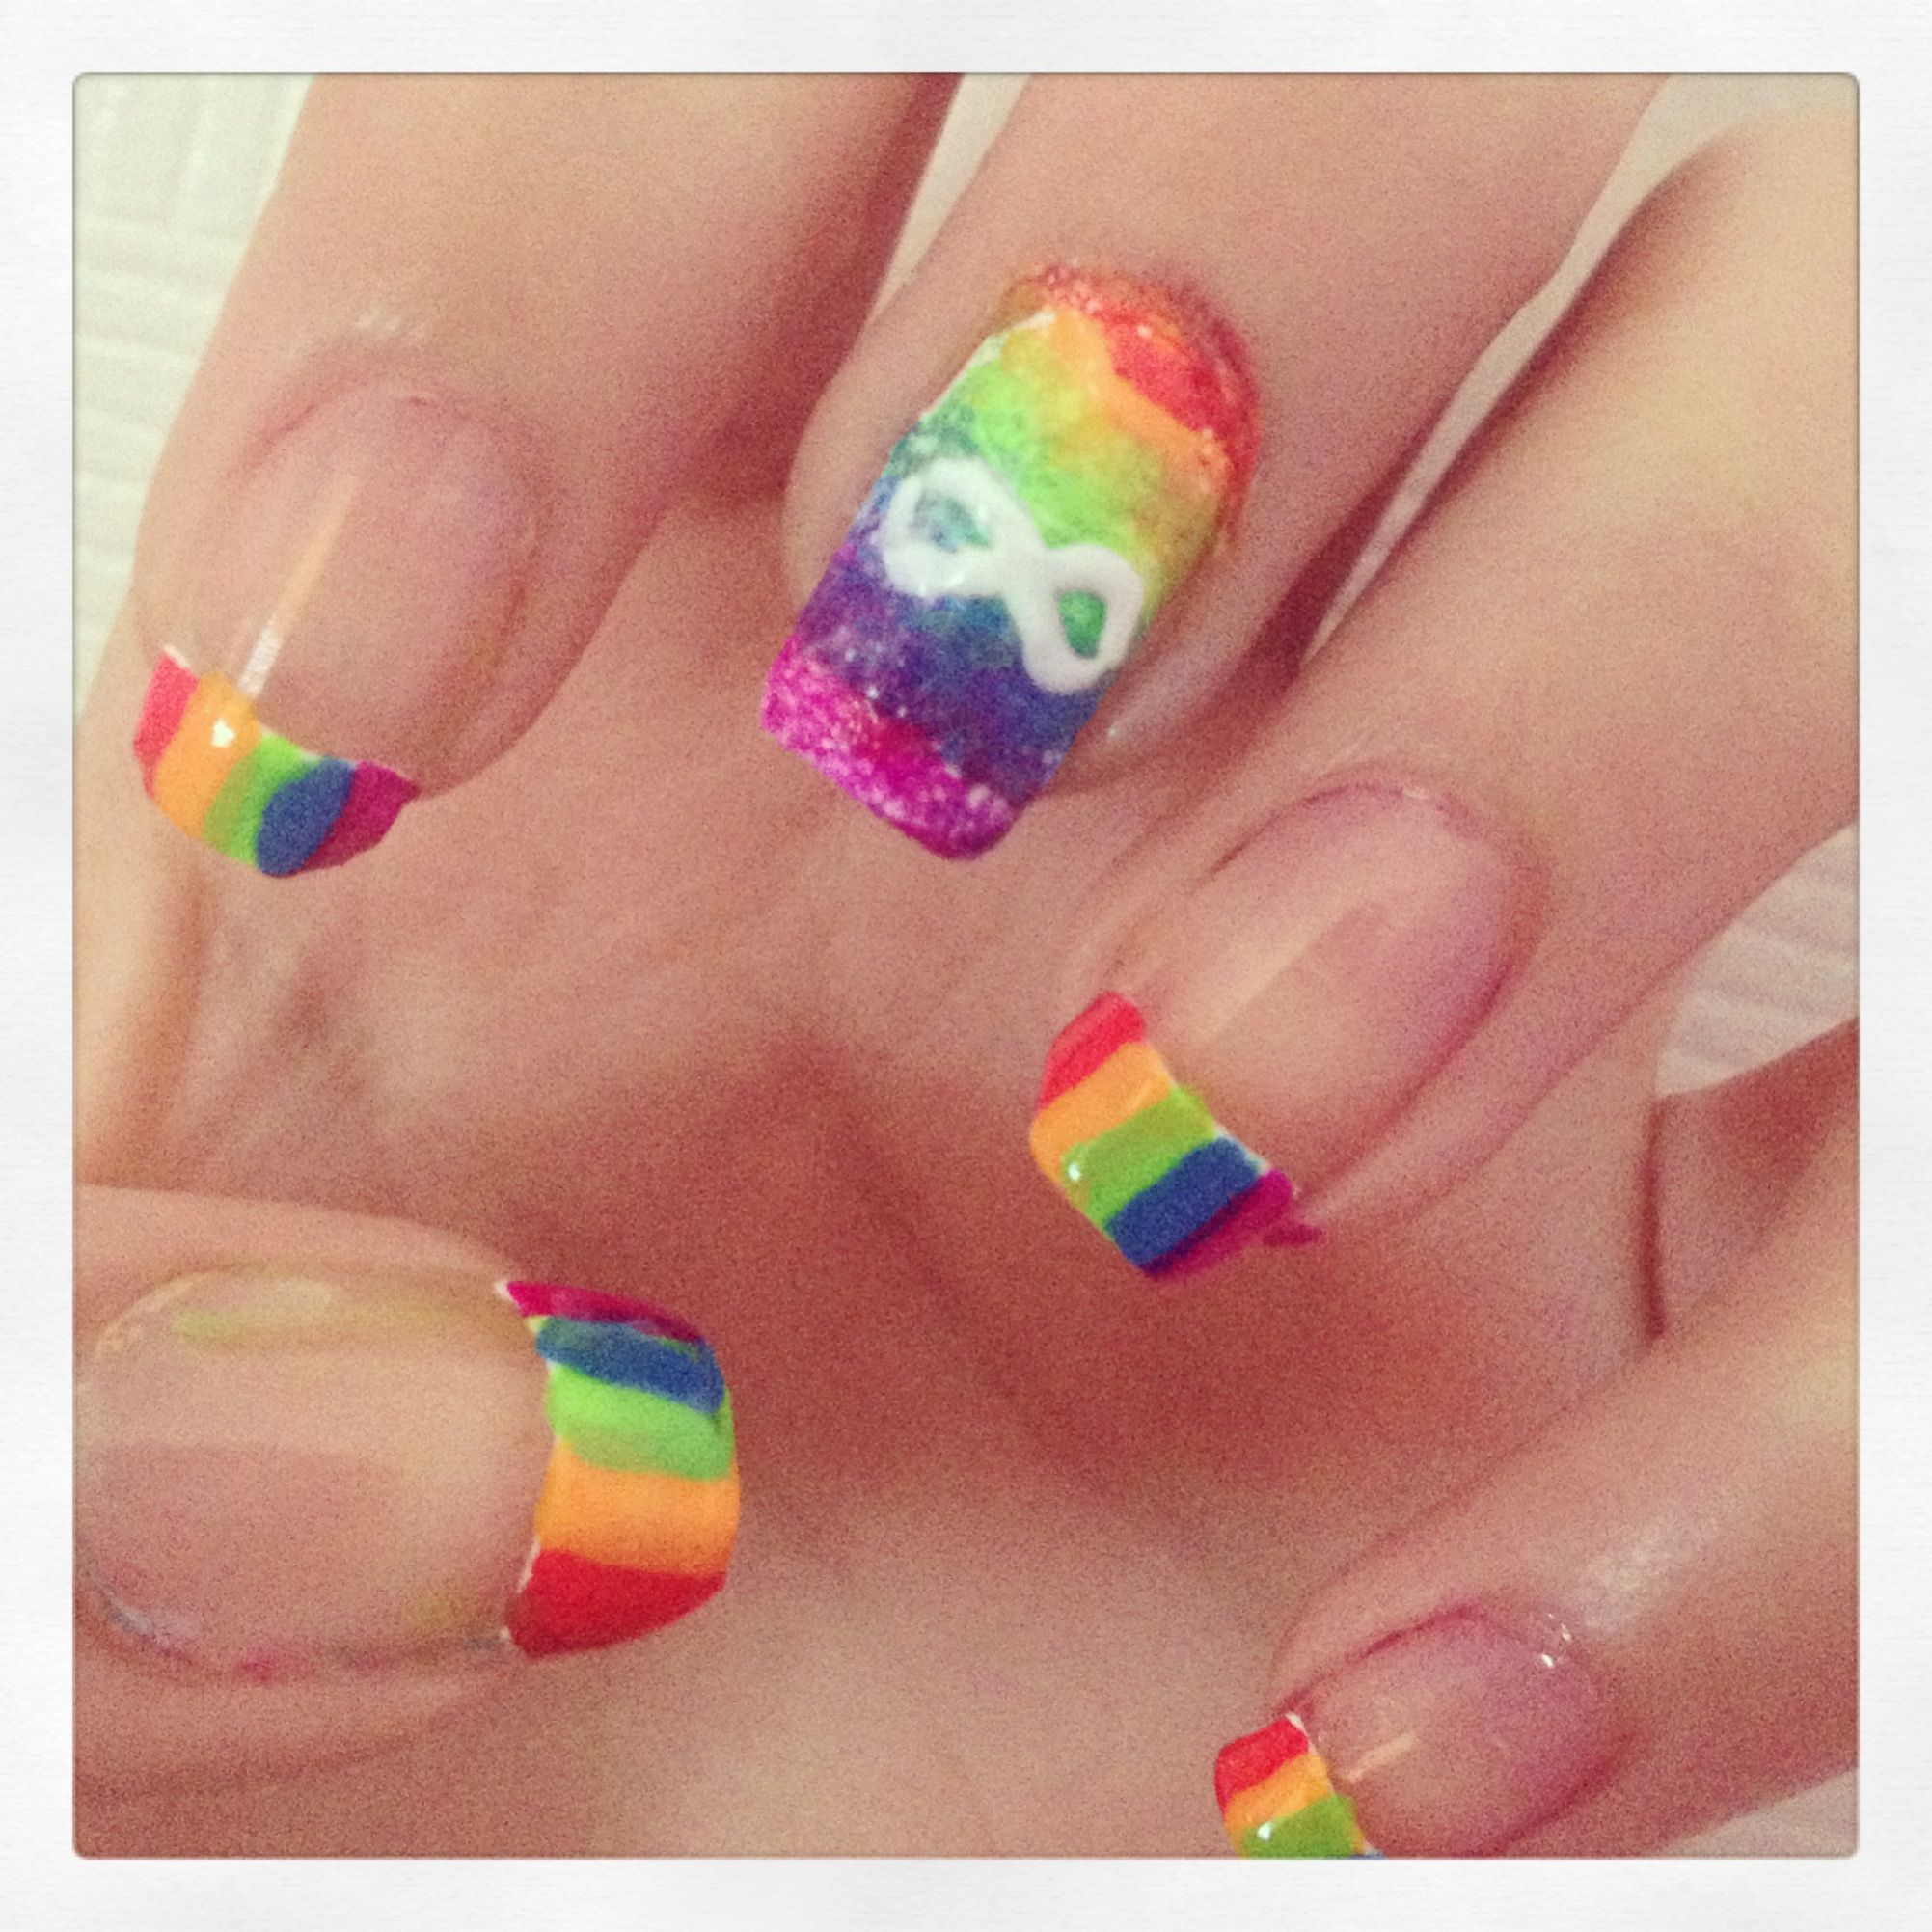 ∞Infinity nails∞ | My nail designs | Pinterest | Infinity nails ...